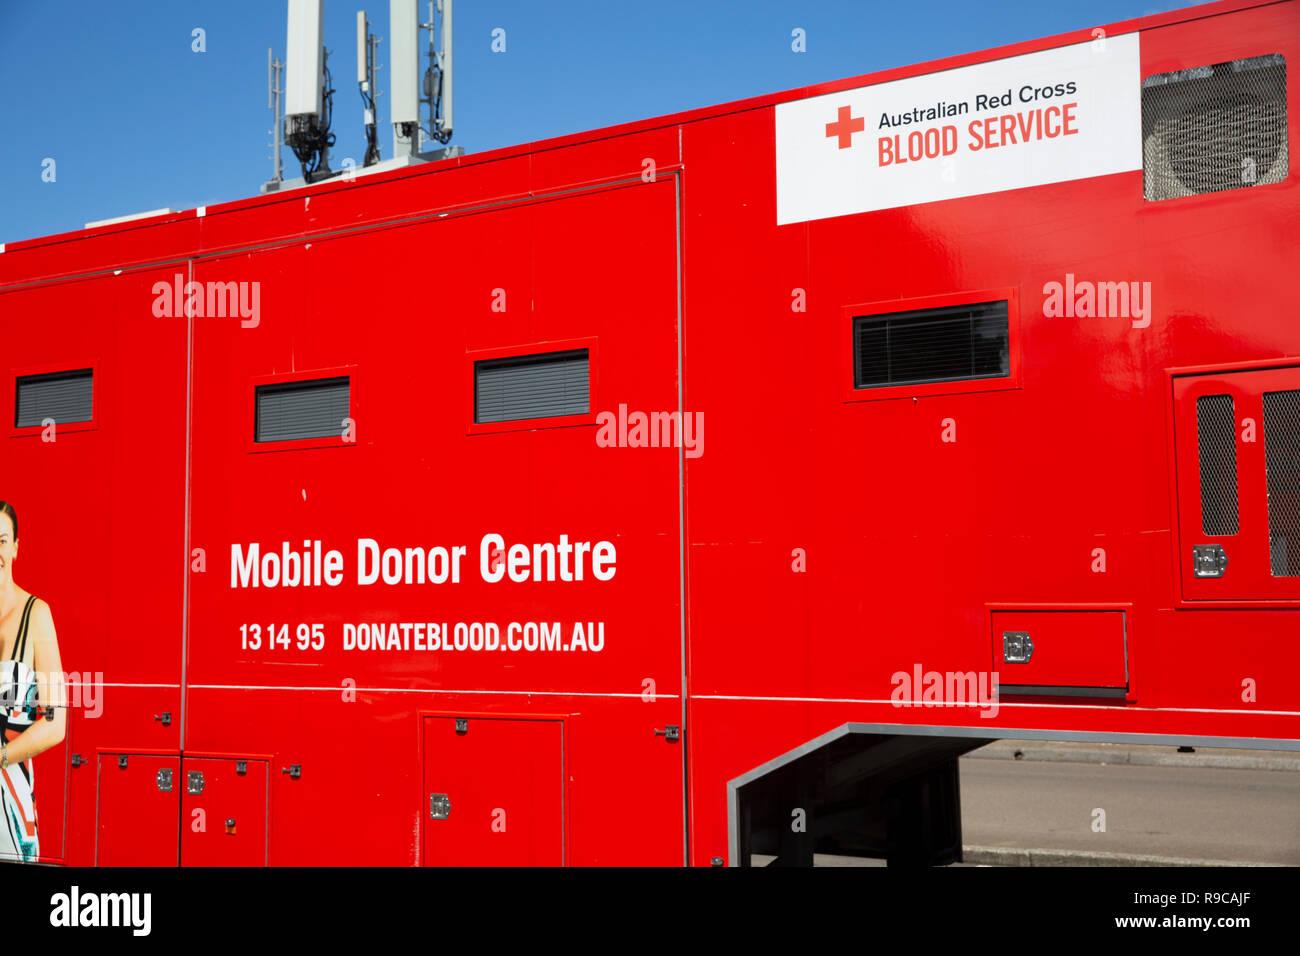 Australian red cross mobile blood donor centre in Sydney,Australia - Stock Image